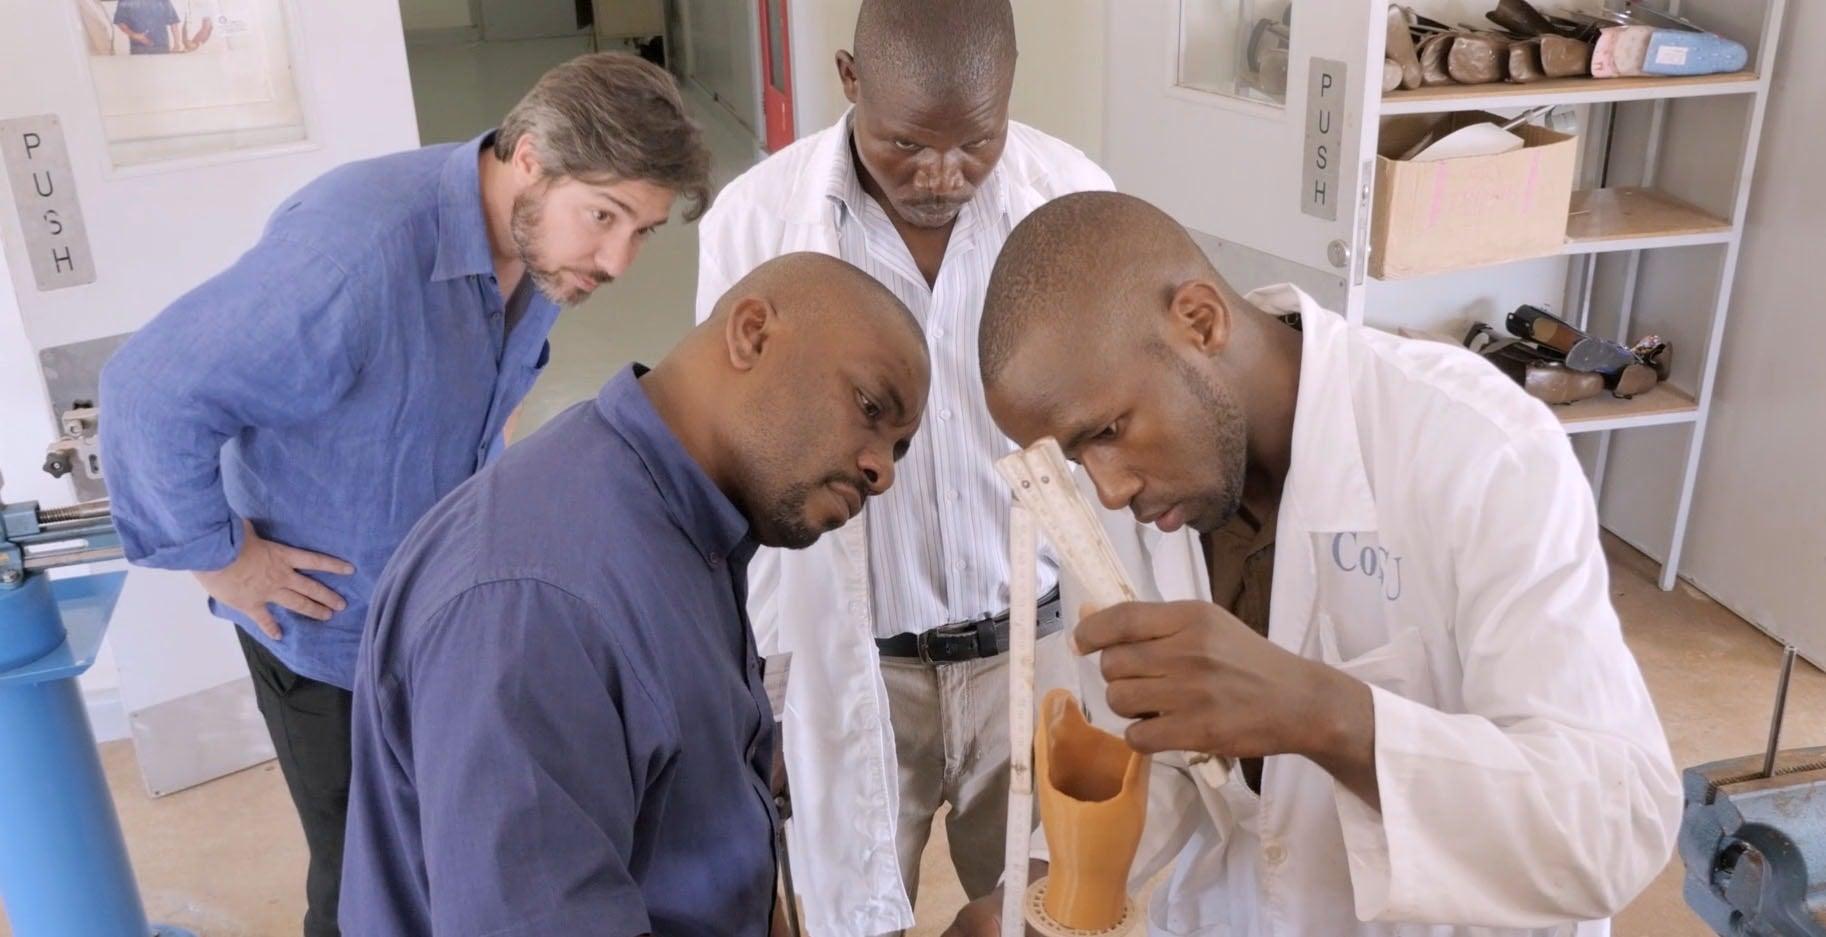 Medical doctors examine 3D prosthetic limb